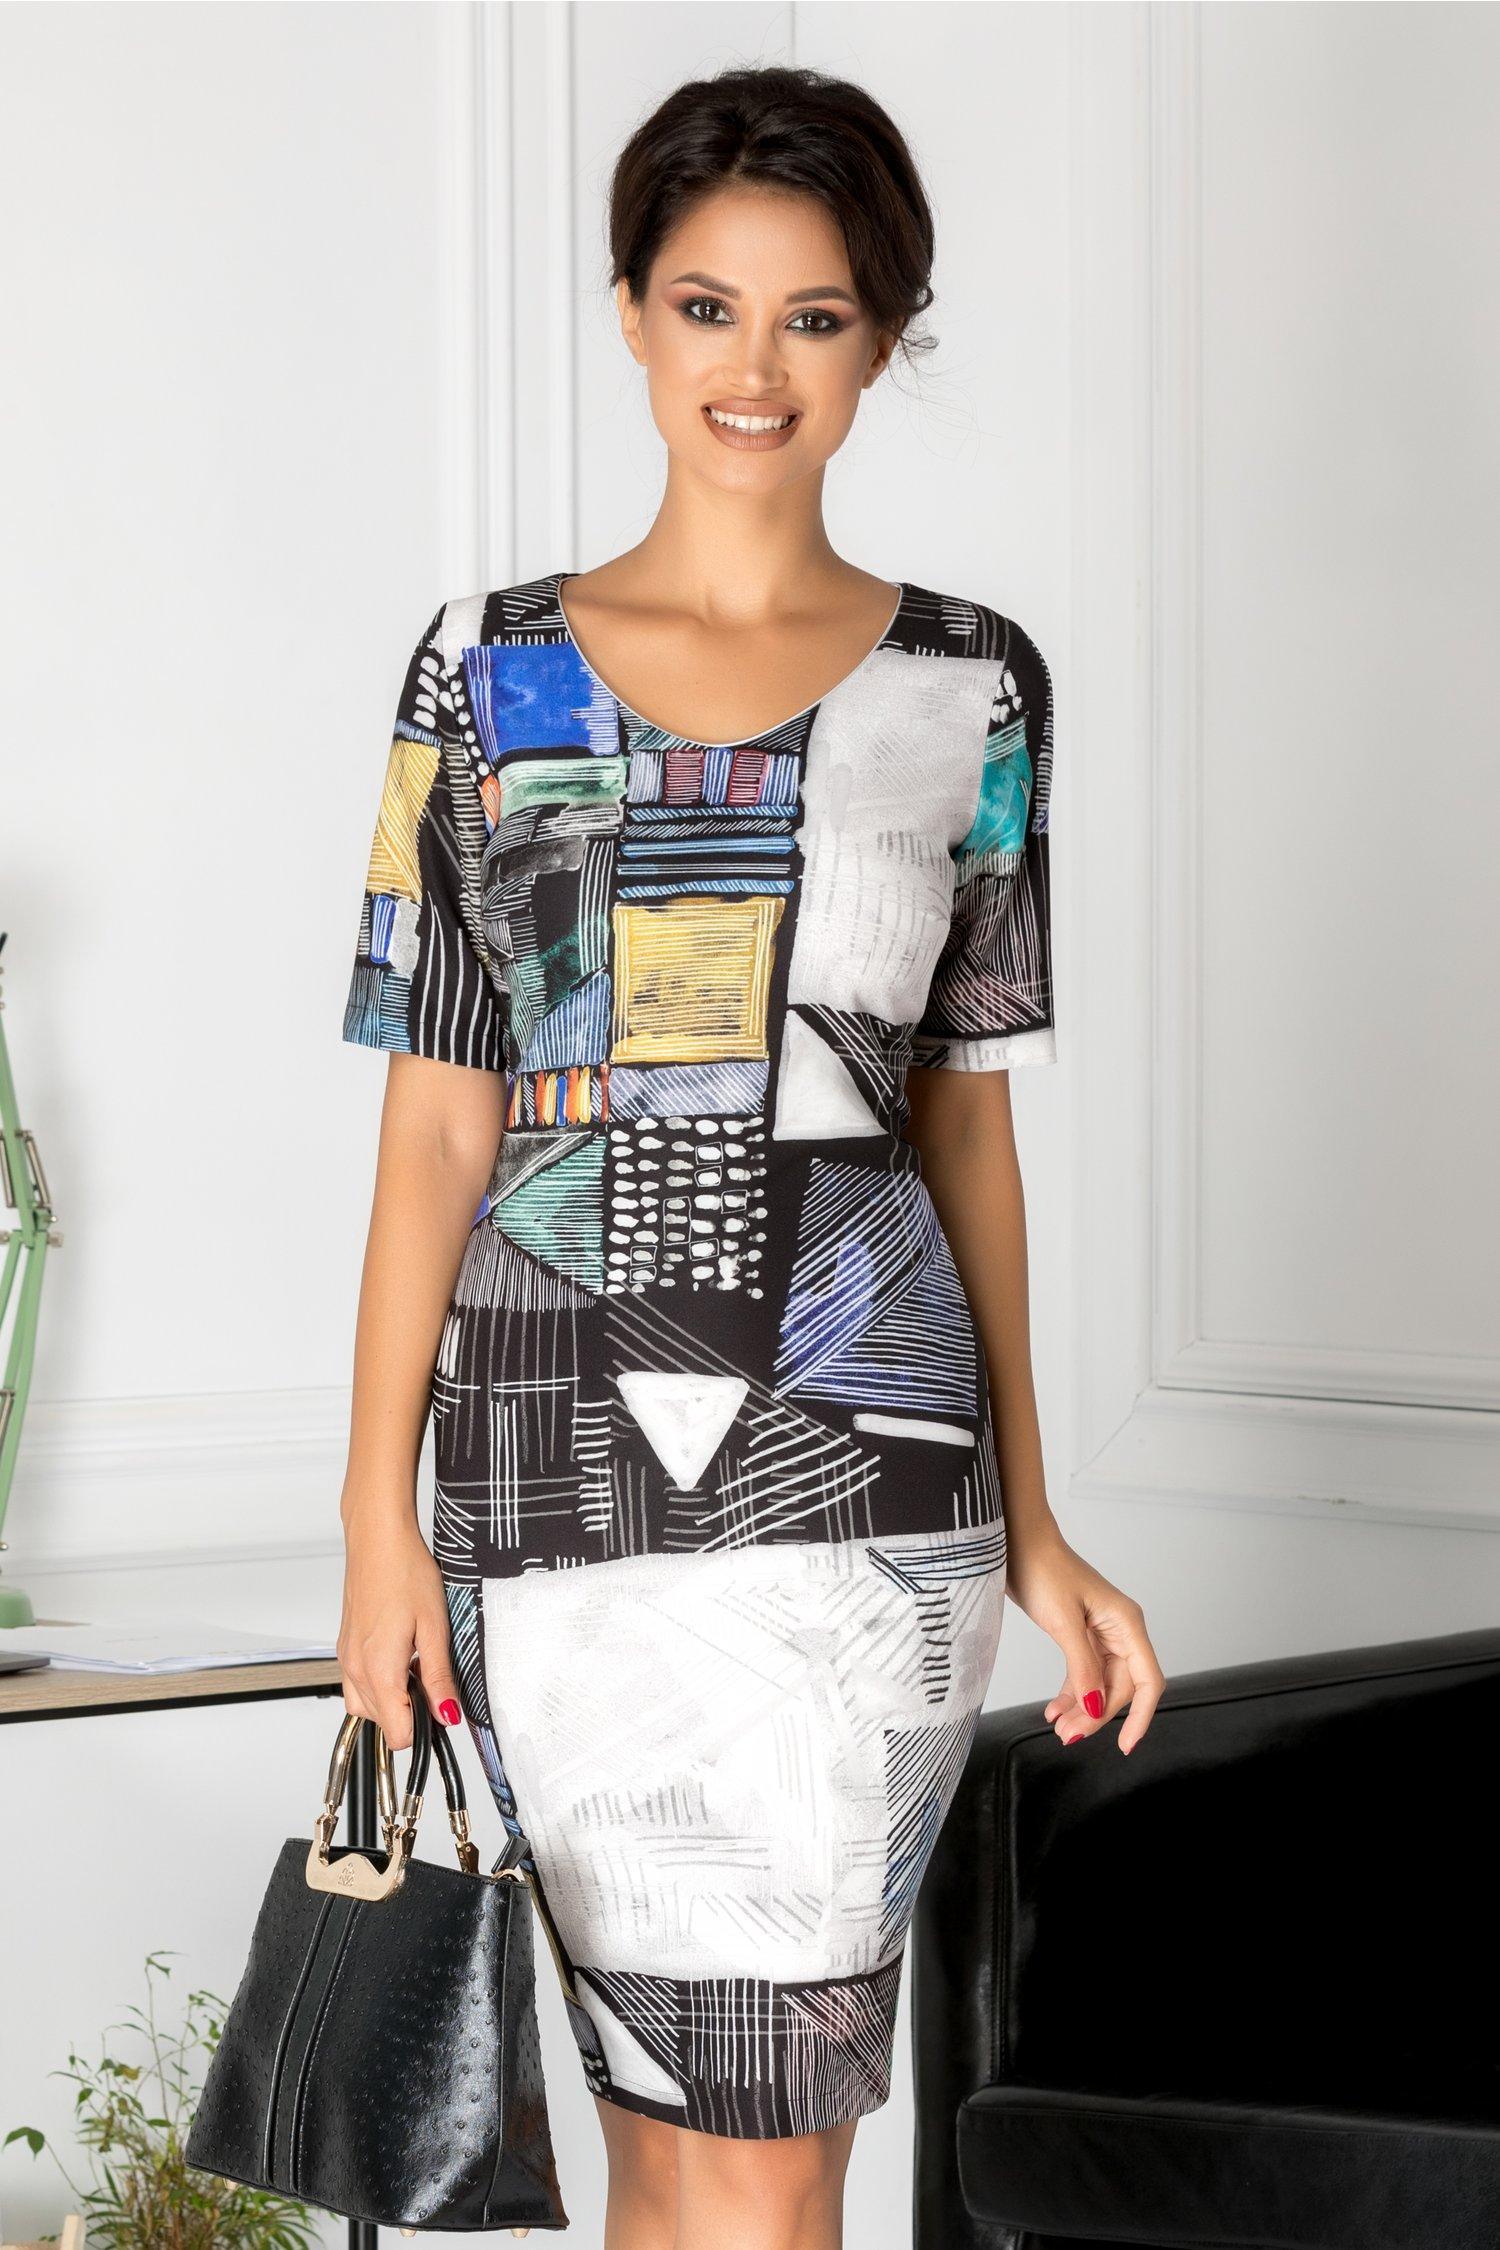 Rochie Luana de zi cu imprimeuri colorate diverse